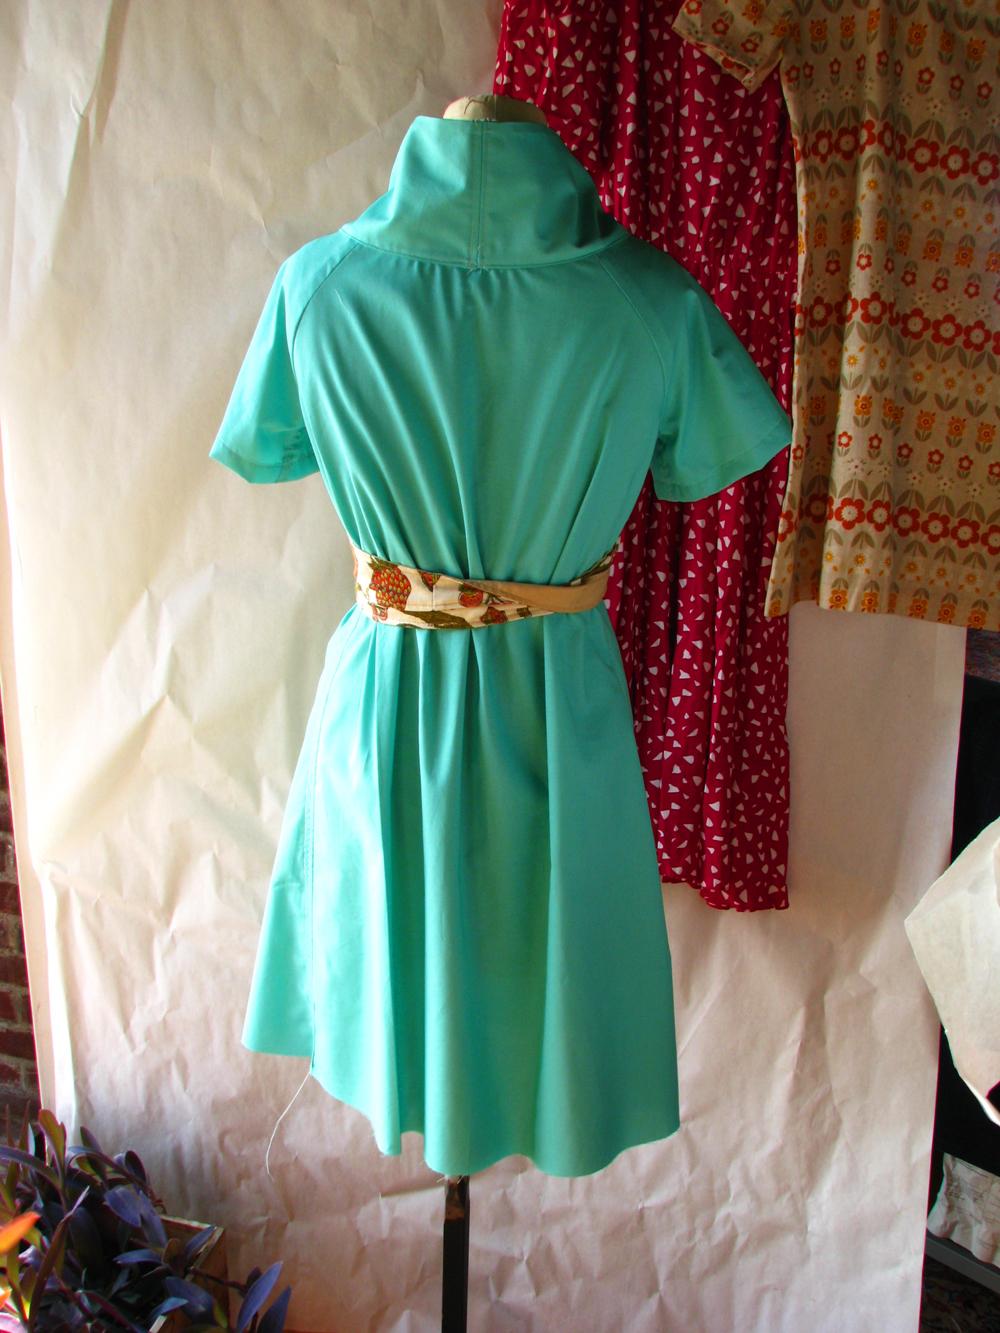 new-designs-now-on-etsy_3810183128_o.jpg